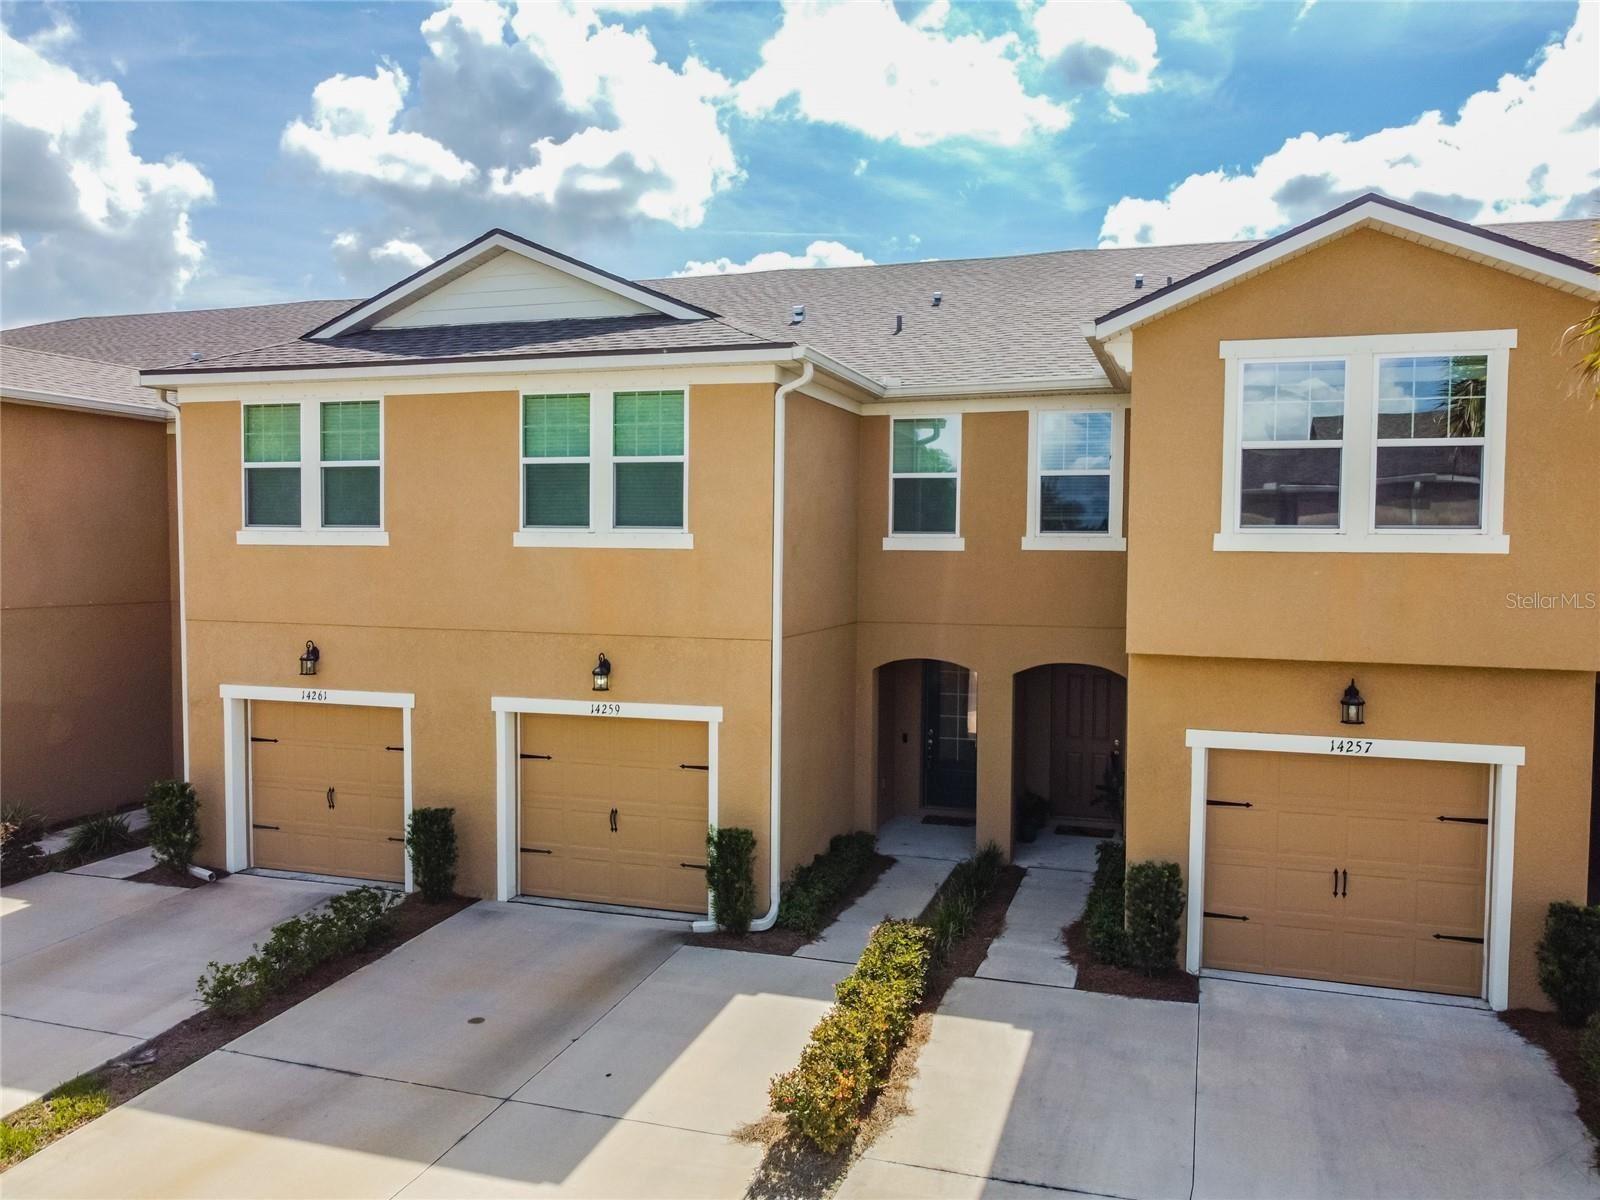 14259 DAMSELFLY DRIVE, Tampa, FL 33625 - #: U8130741